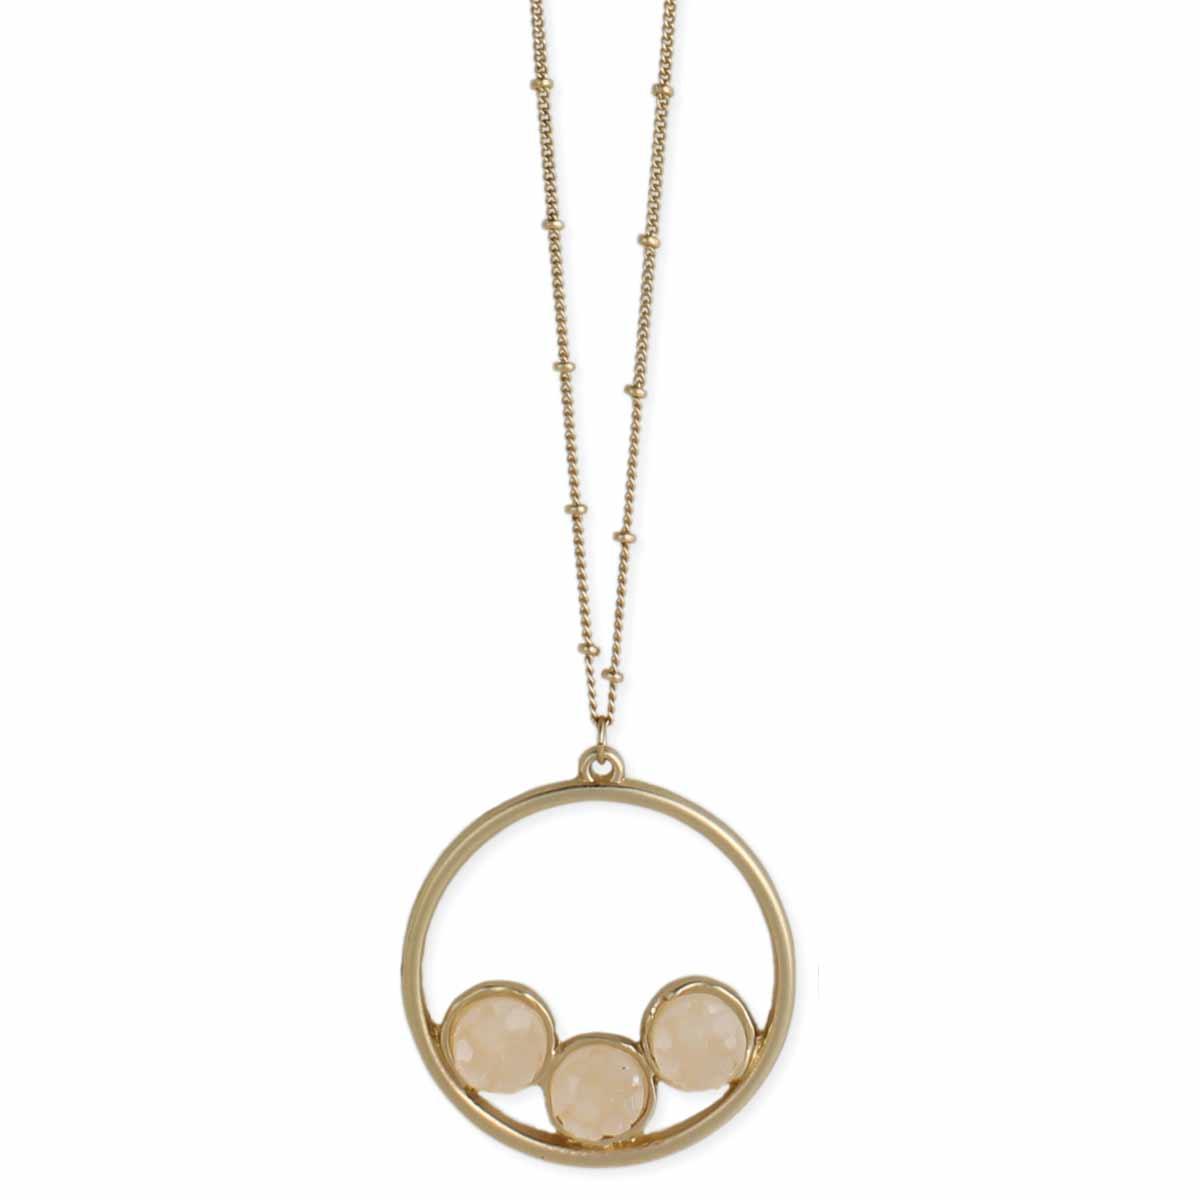 Wholesale gold long druzy pendant necklace zad fashion costume gold long druzy pendant necklace view detailed images 2 aloadofball Images